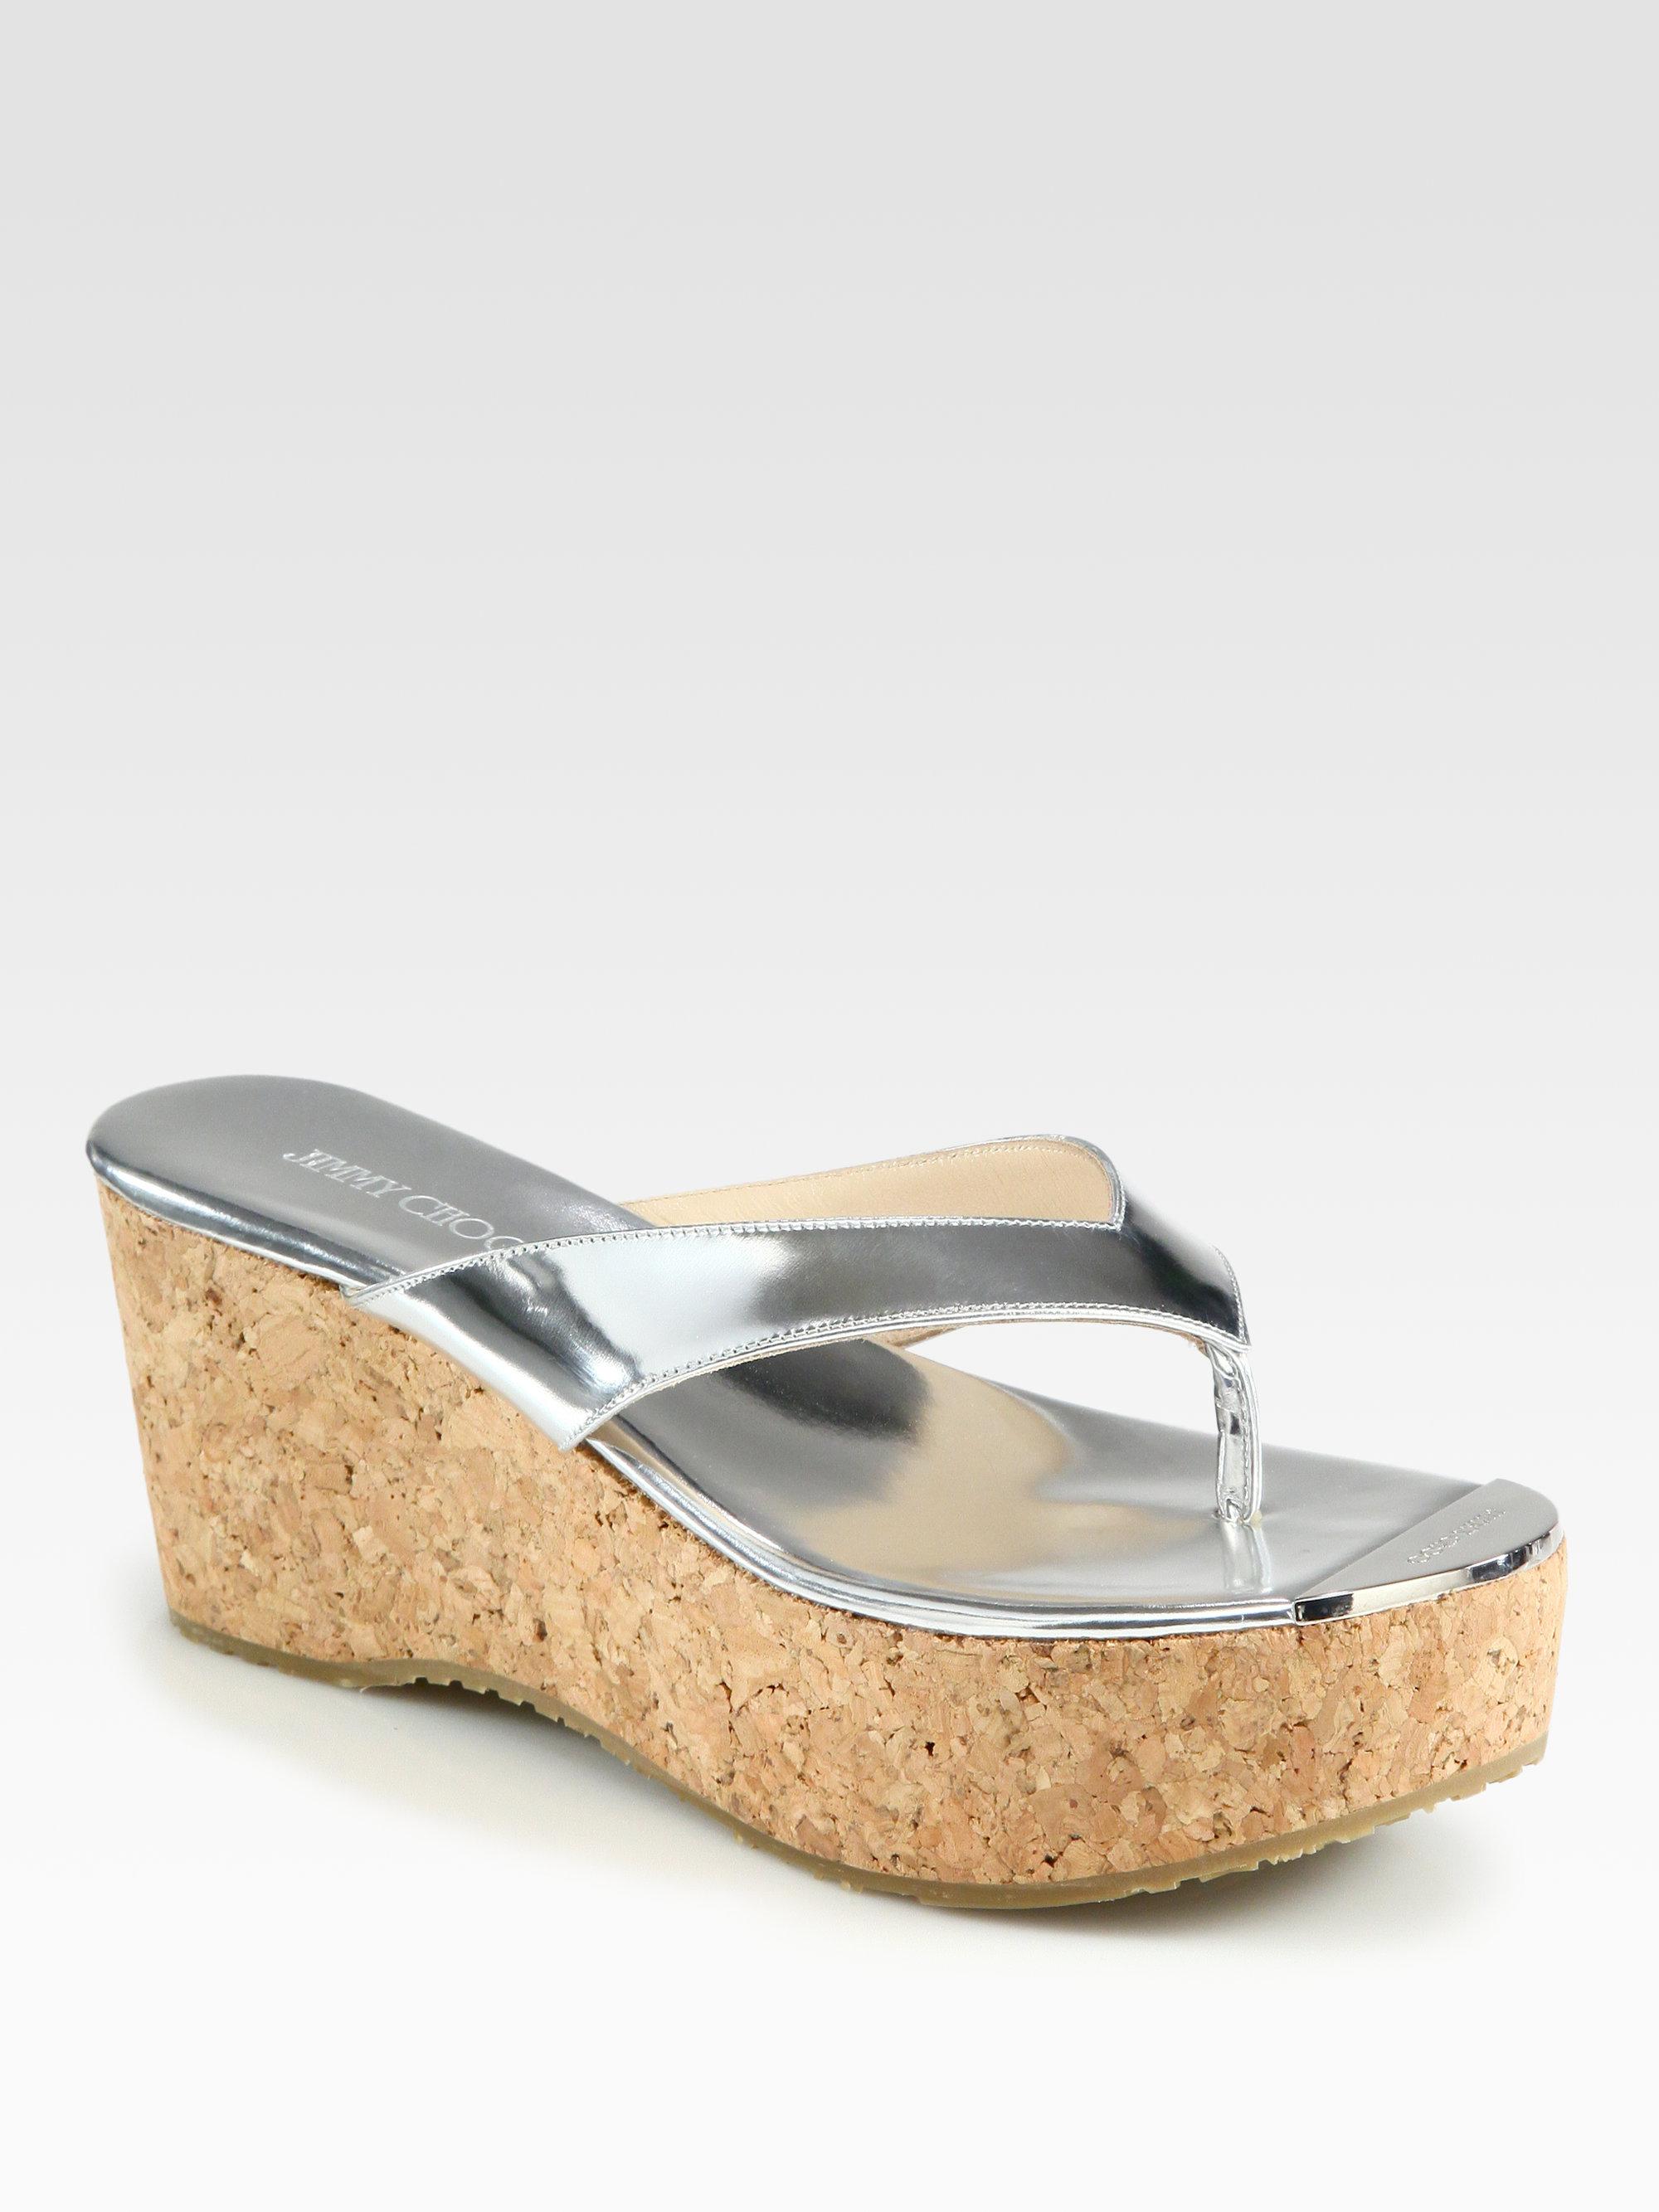 7c7f7105a22 Lyst - Jimmy Choo Pathos Metallic Leather Cork Wedge Sandals